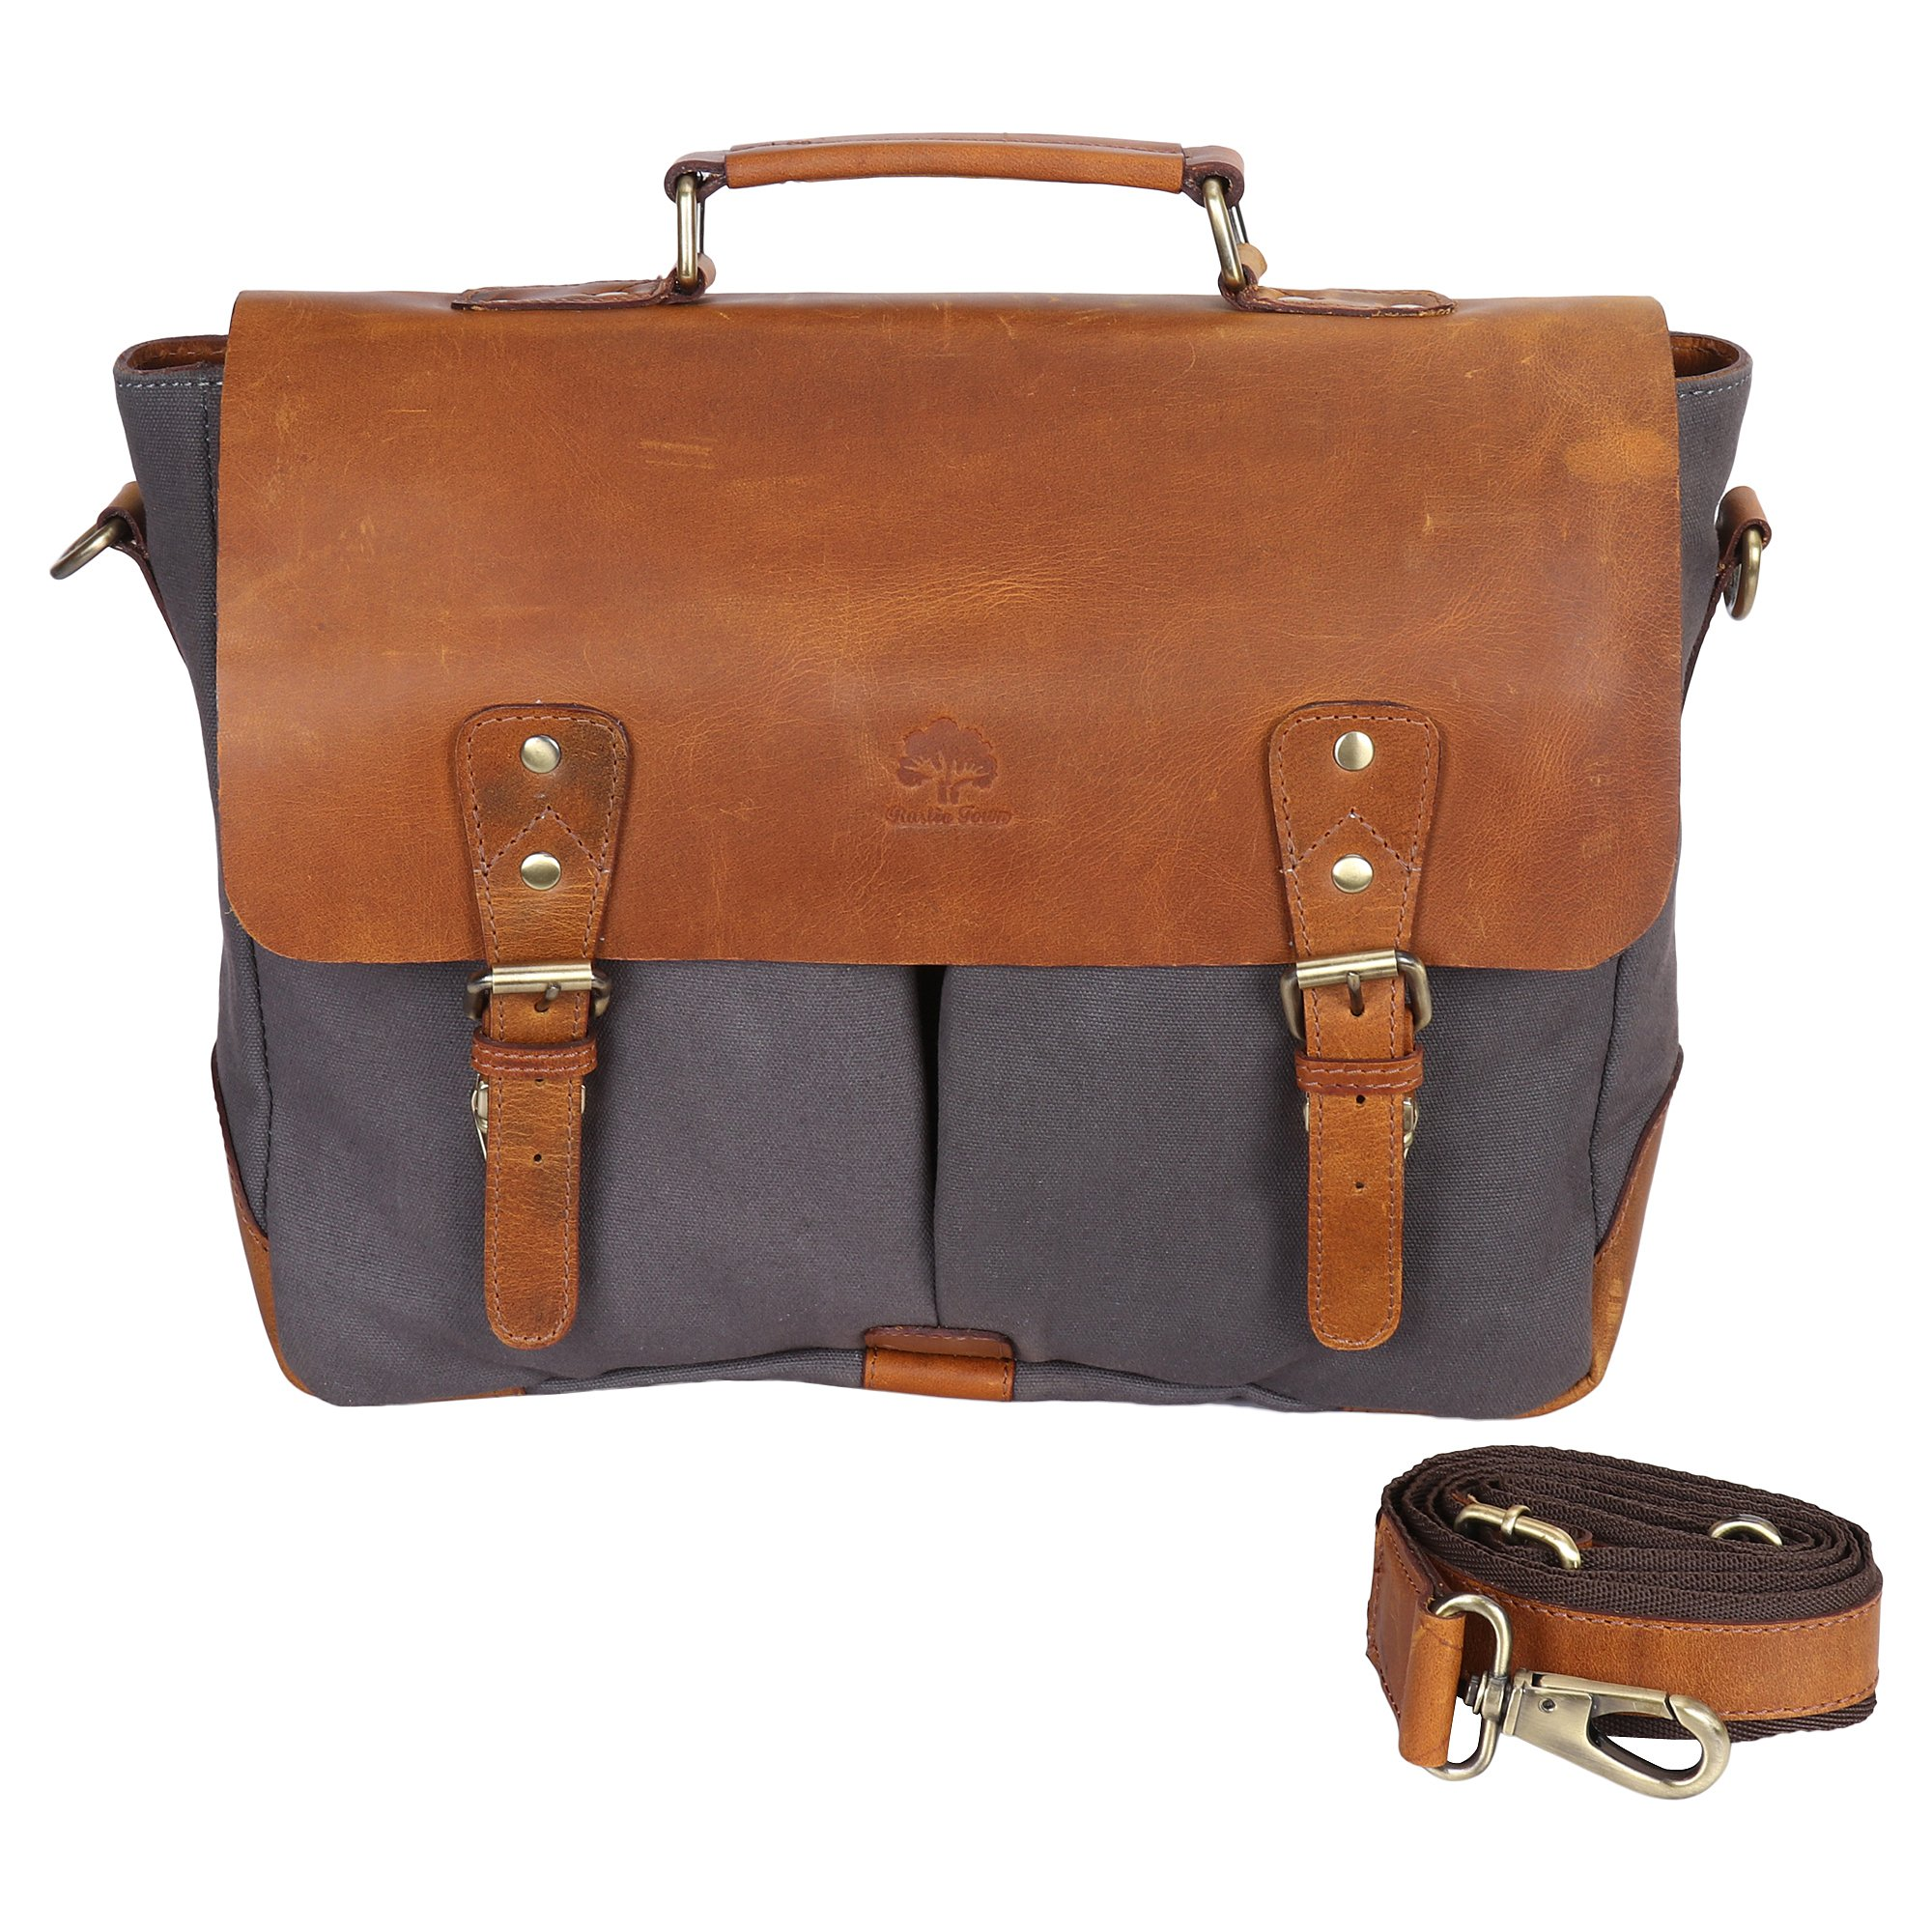 RusticTown Handmade Leather Canvas Vintage Crossbody Messenger Bag Gift Men Women Travel Work ~ Carry Laptop Computer Books ~ Everyday Office College School Satchel 15 inch